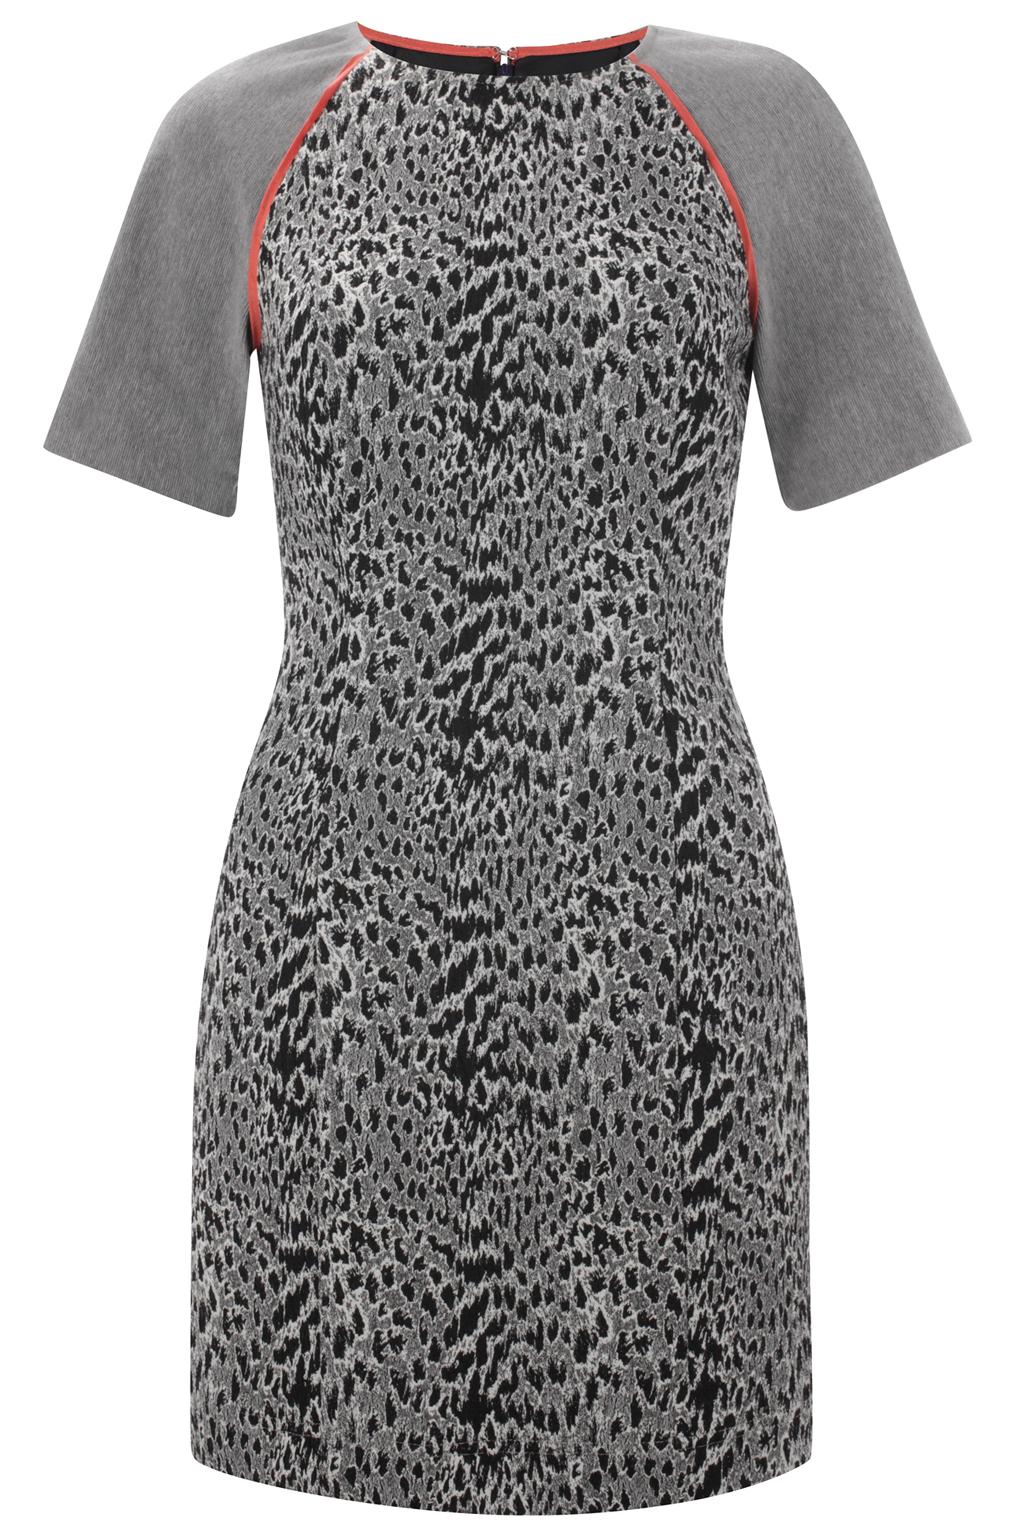 Animal instincts dress